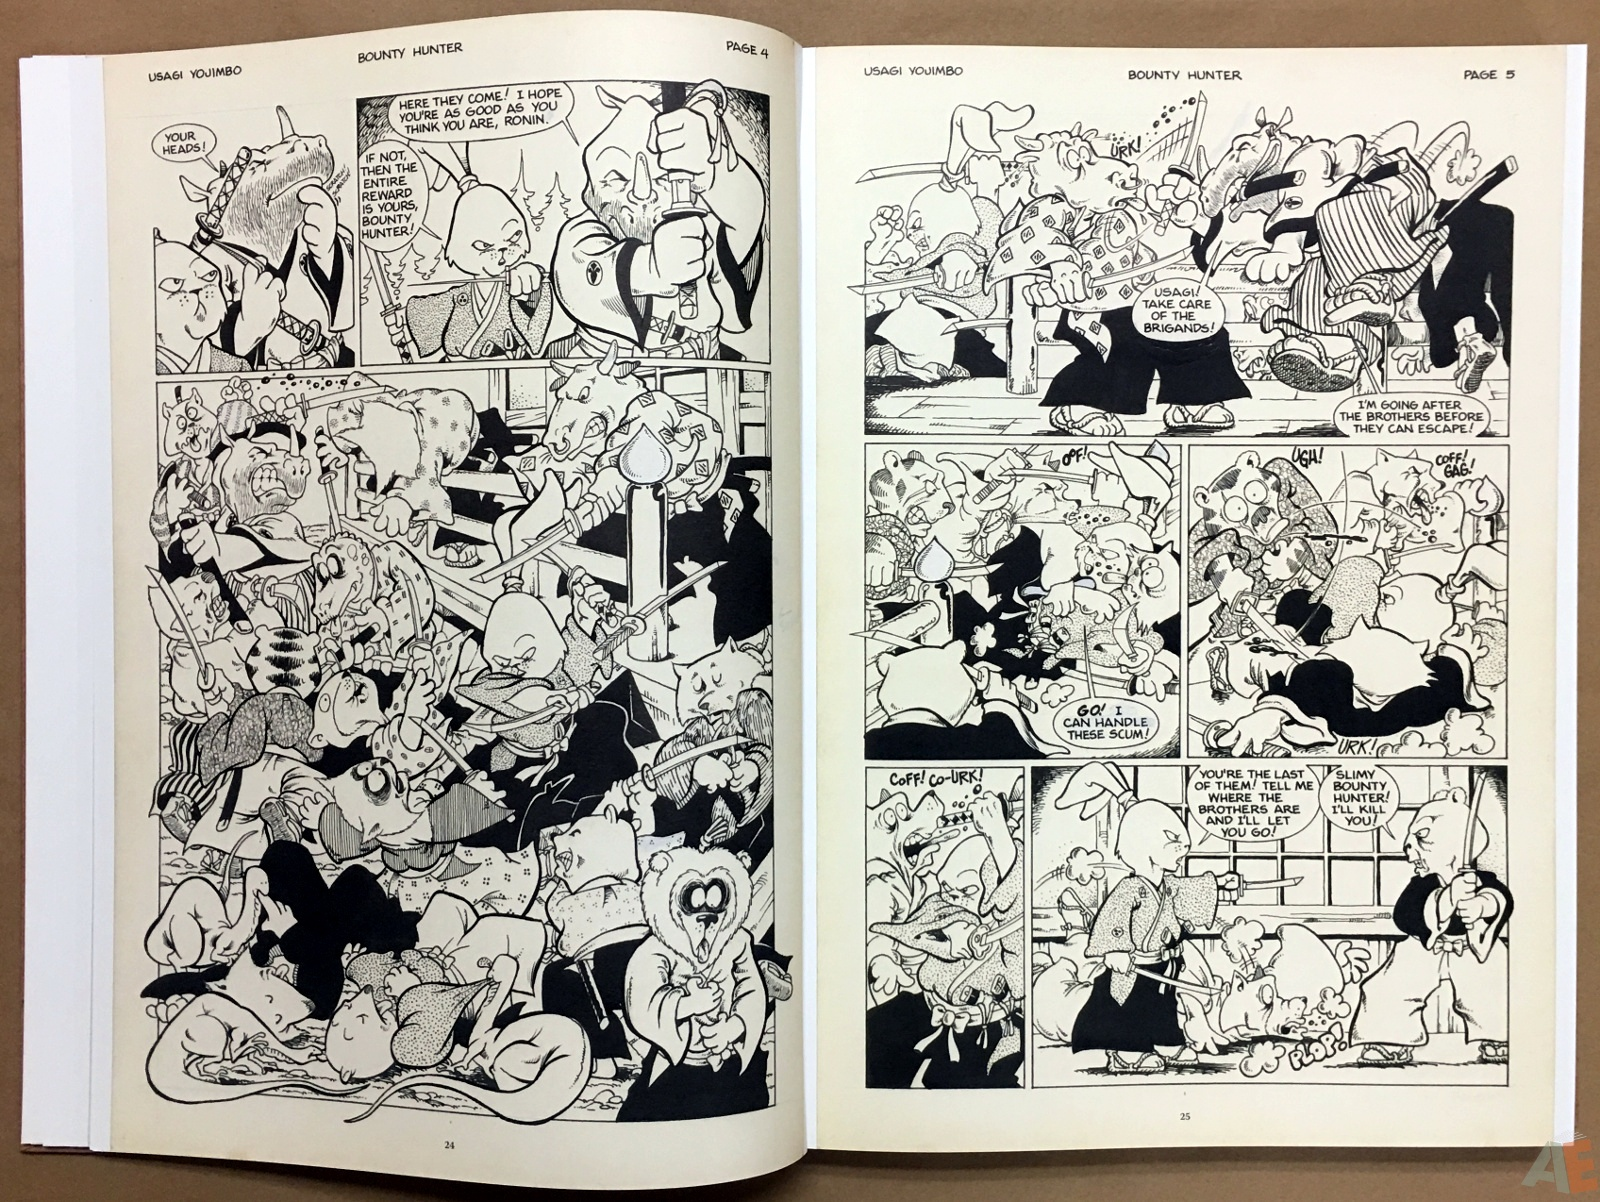 Usagi Yojimbo: Samurai and Other Stories Gallery Edition 14